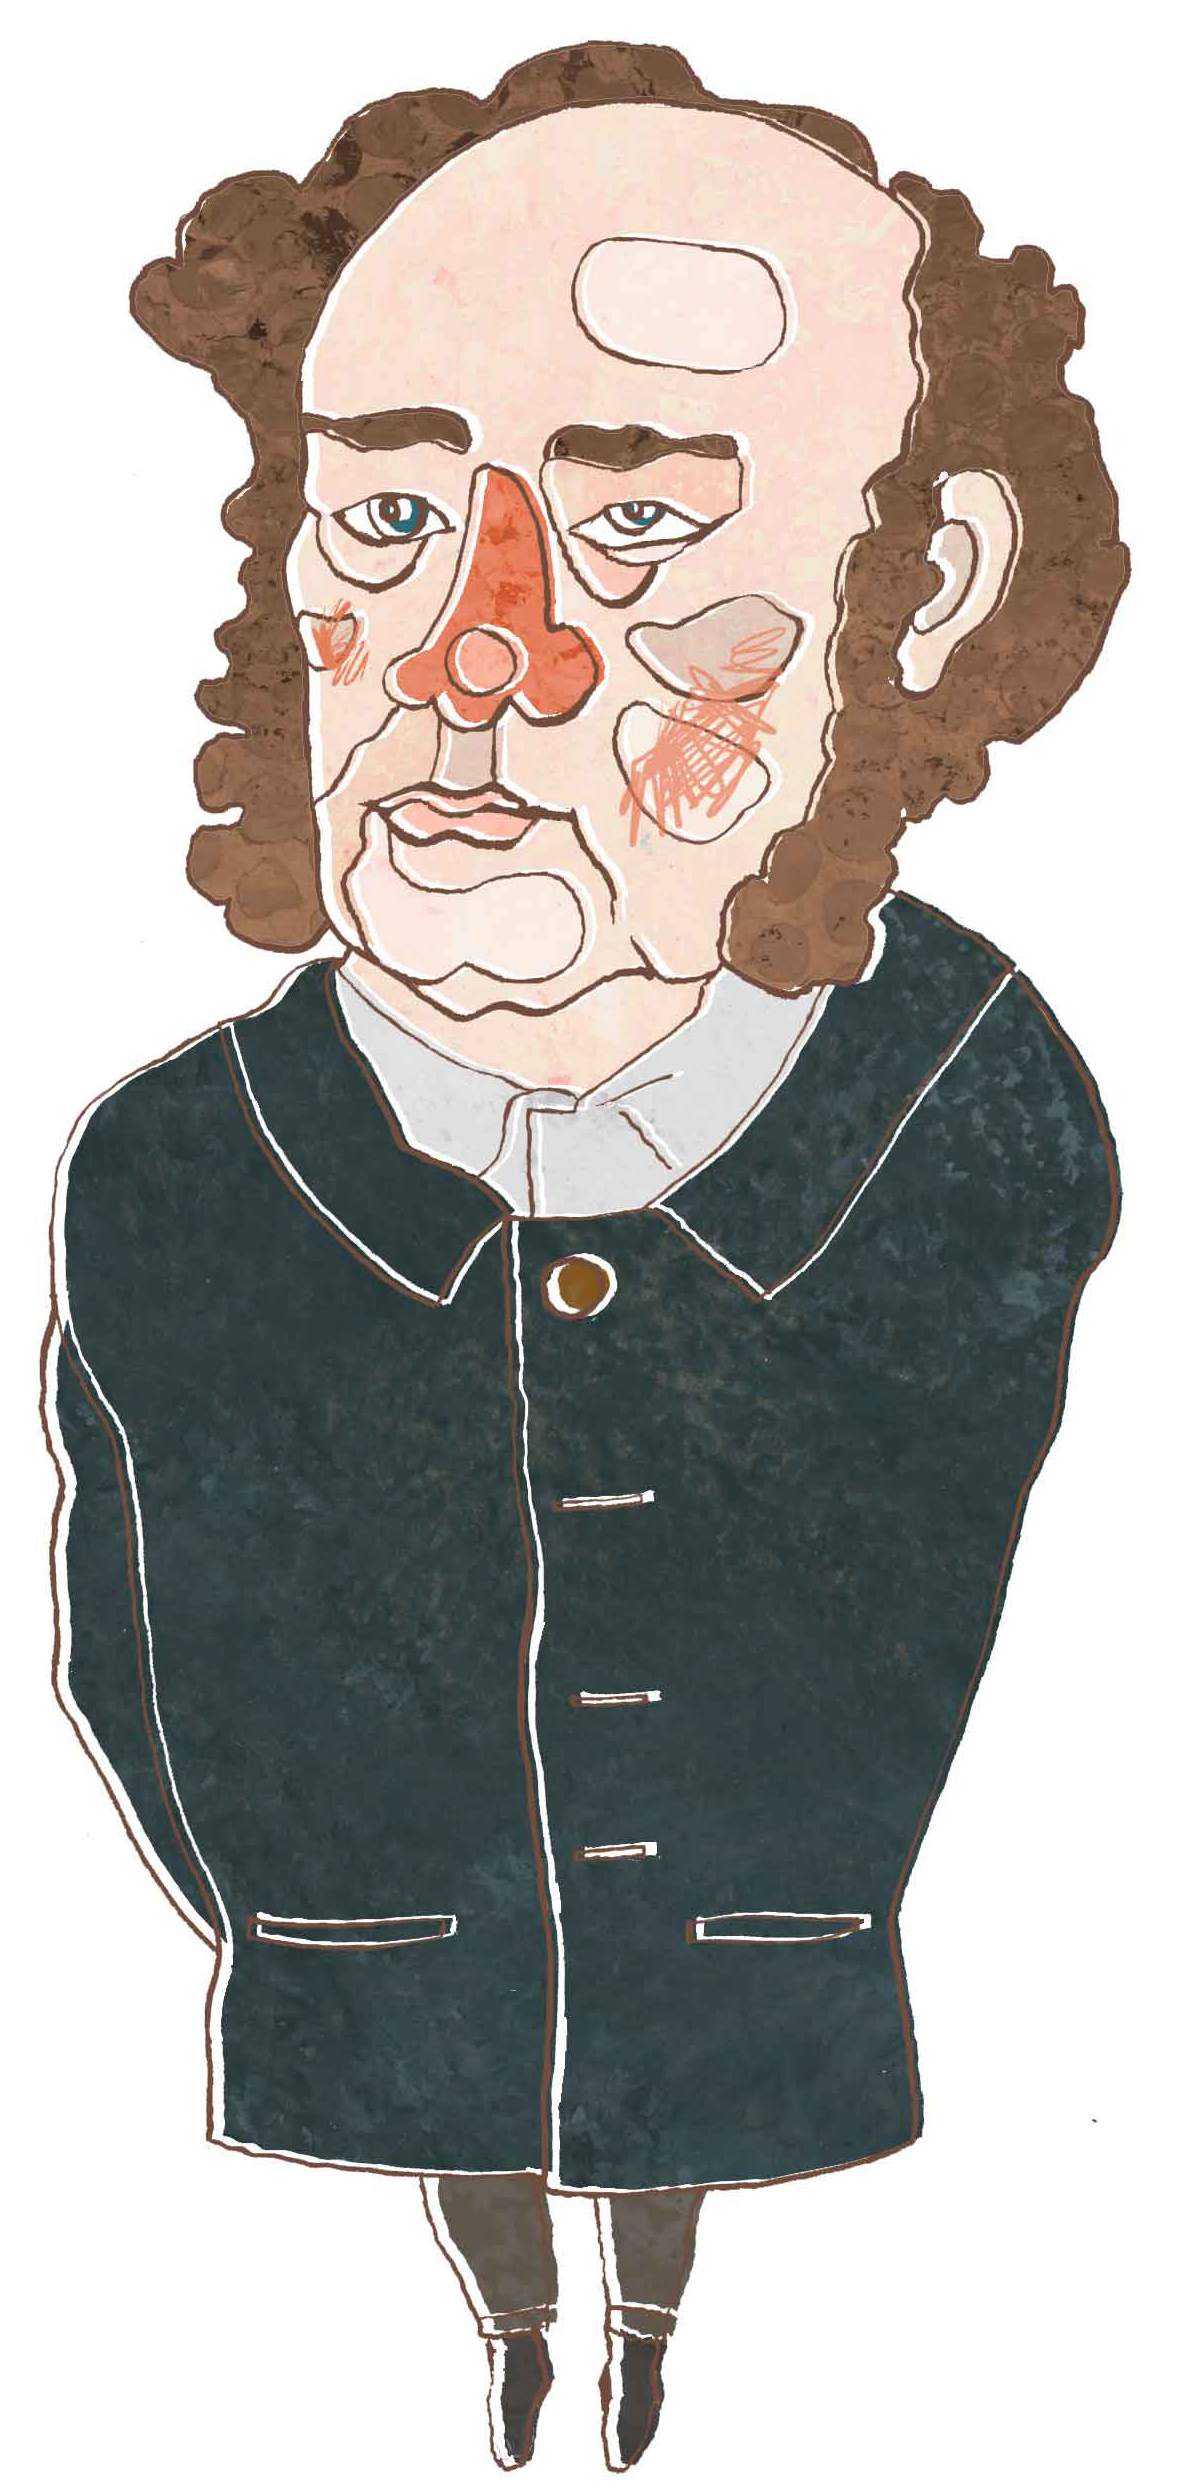 Jonathan Stalker, a prominent Penrith Wesleyan